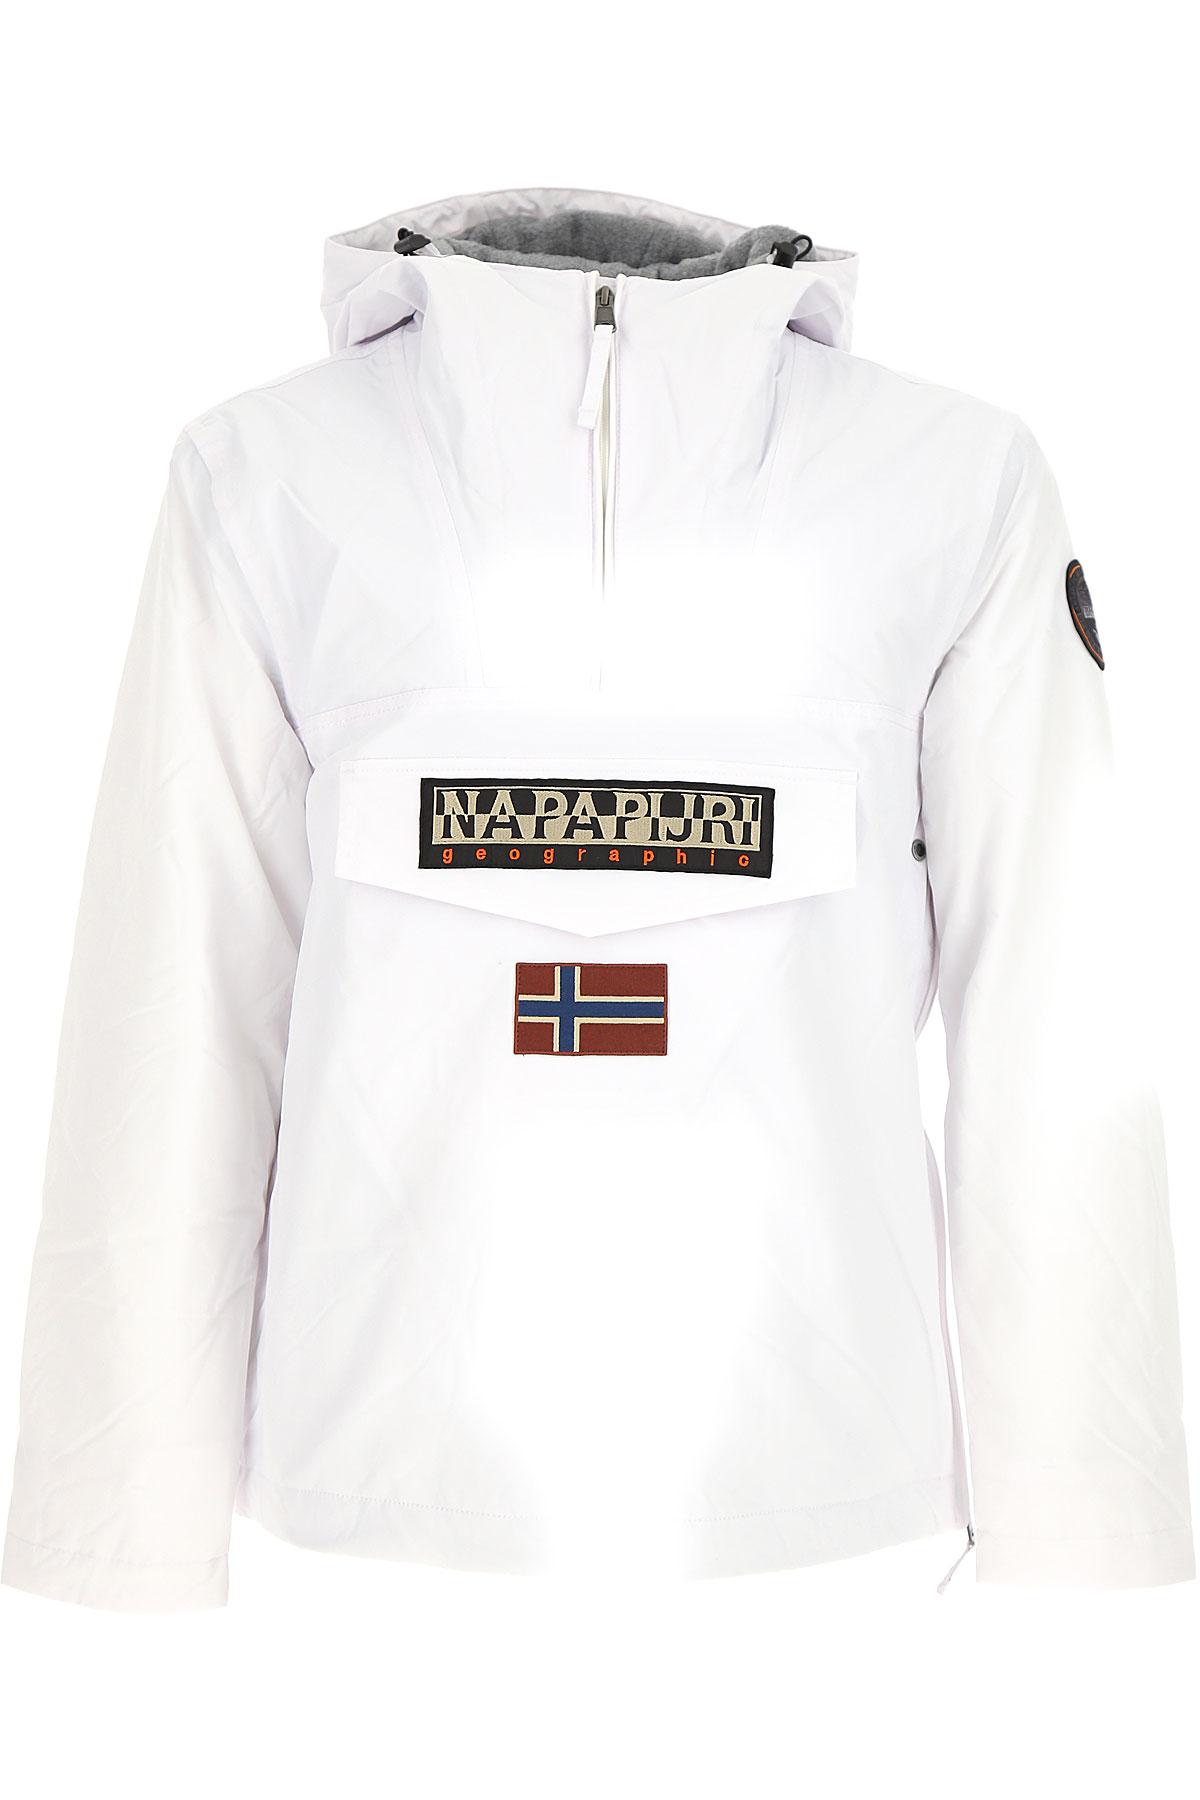 Napapijri Jacket for Men, White, polyamide, 2017, L M S XL